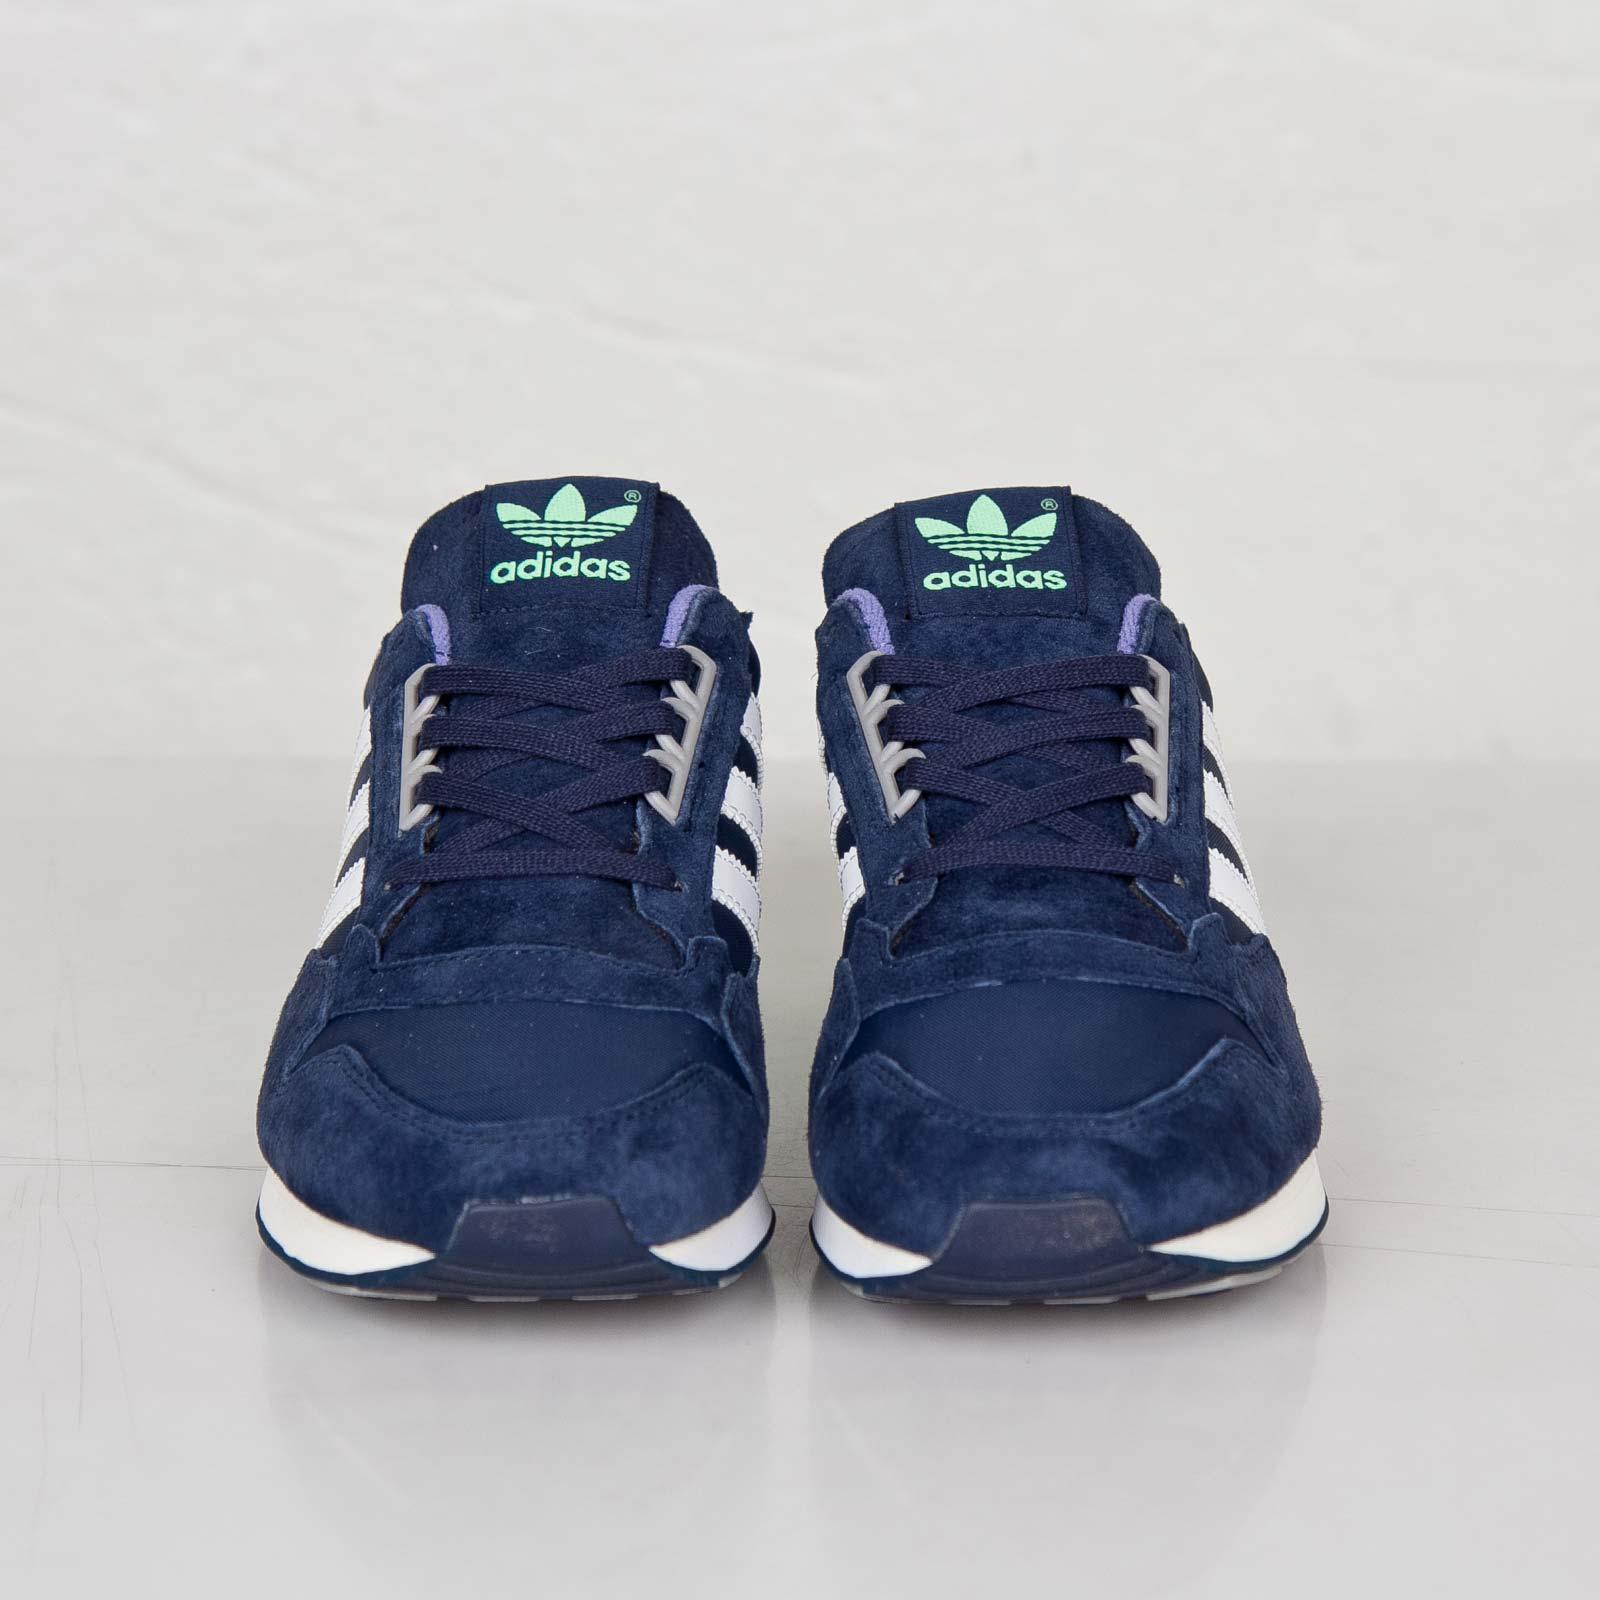 Descolorar Fácil de suceder saldar  adidas originals zx 500 women Green- OFF 51% - www.butc.co.za!